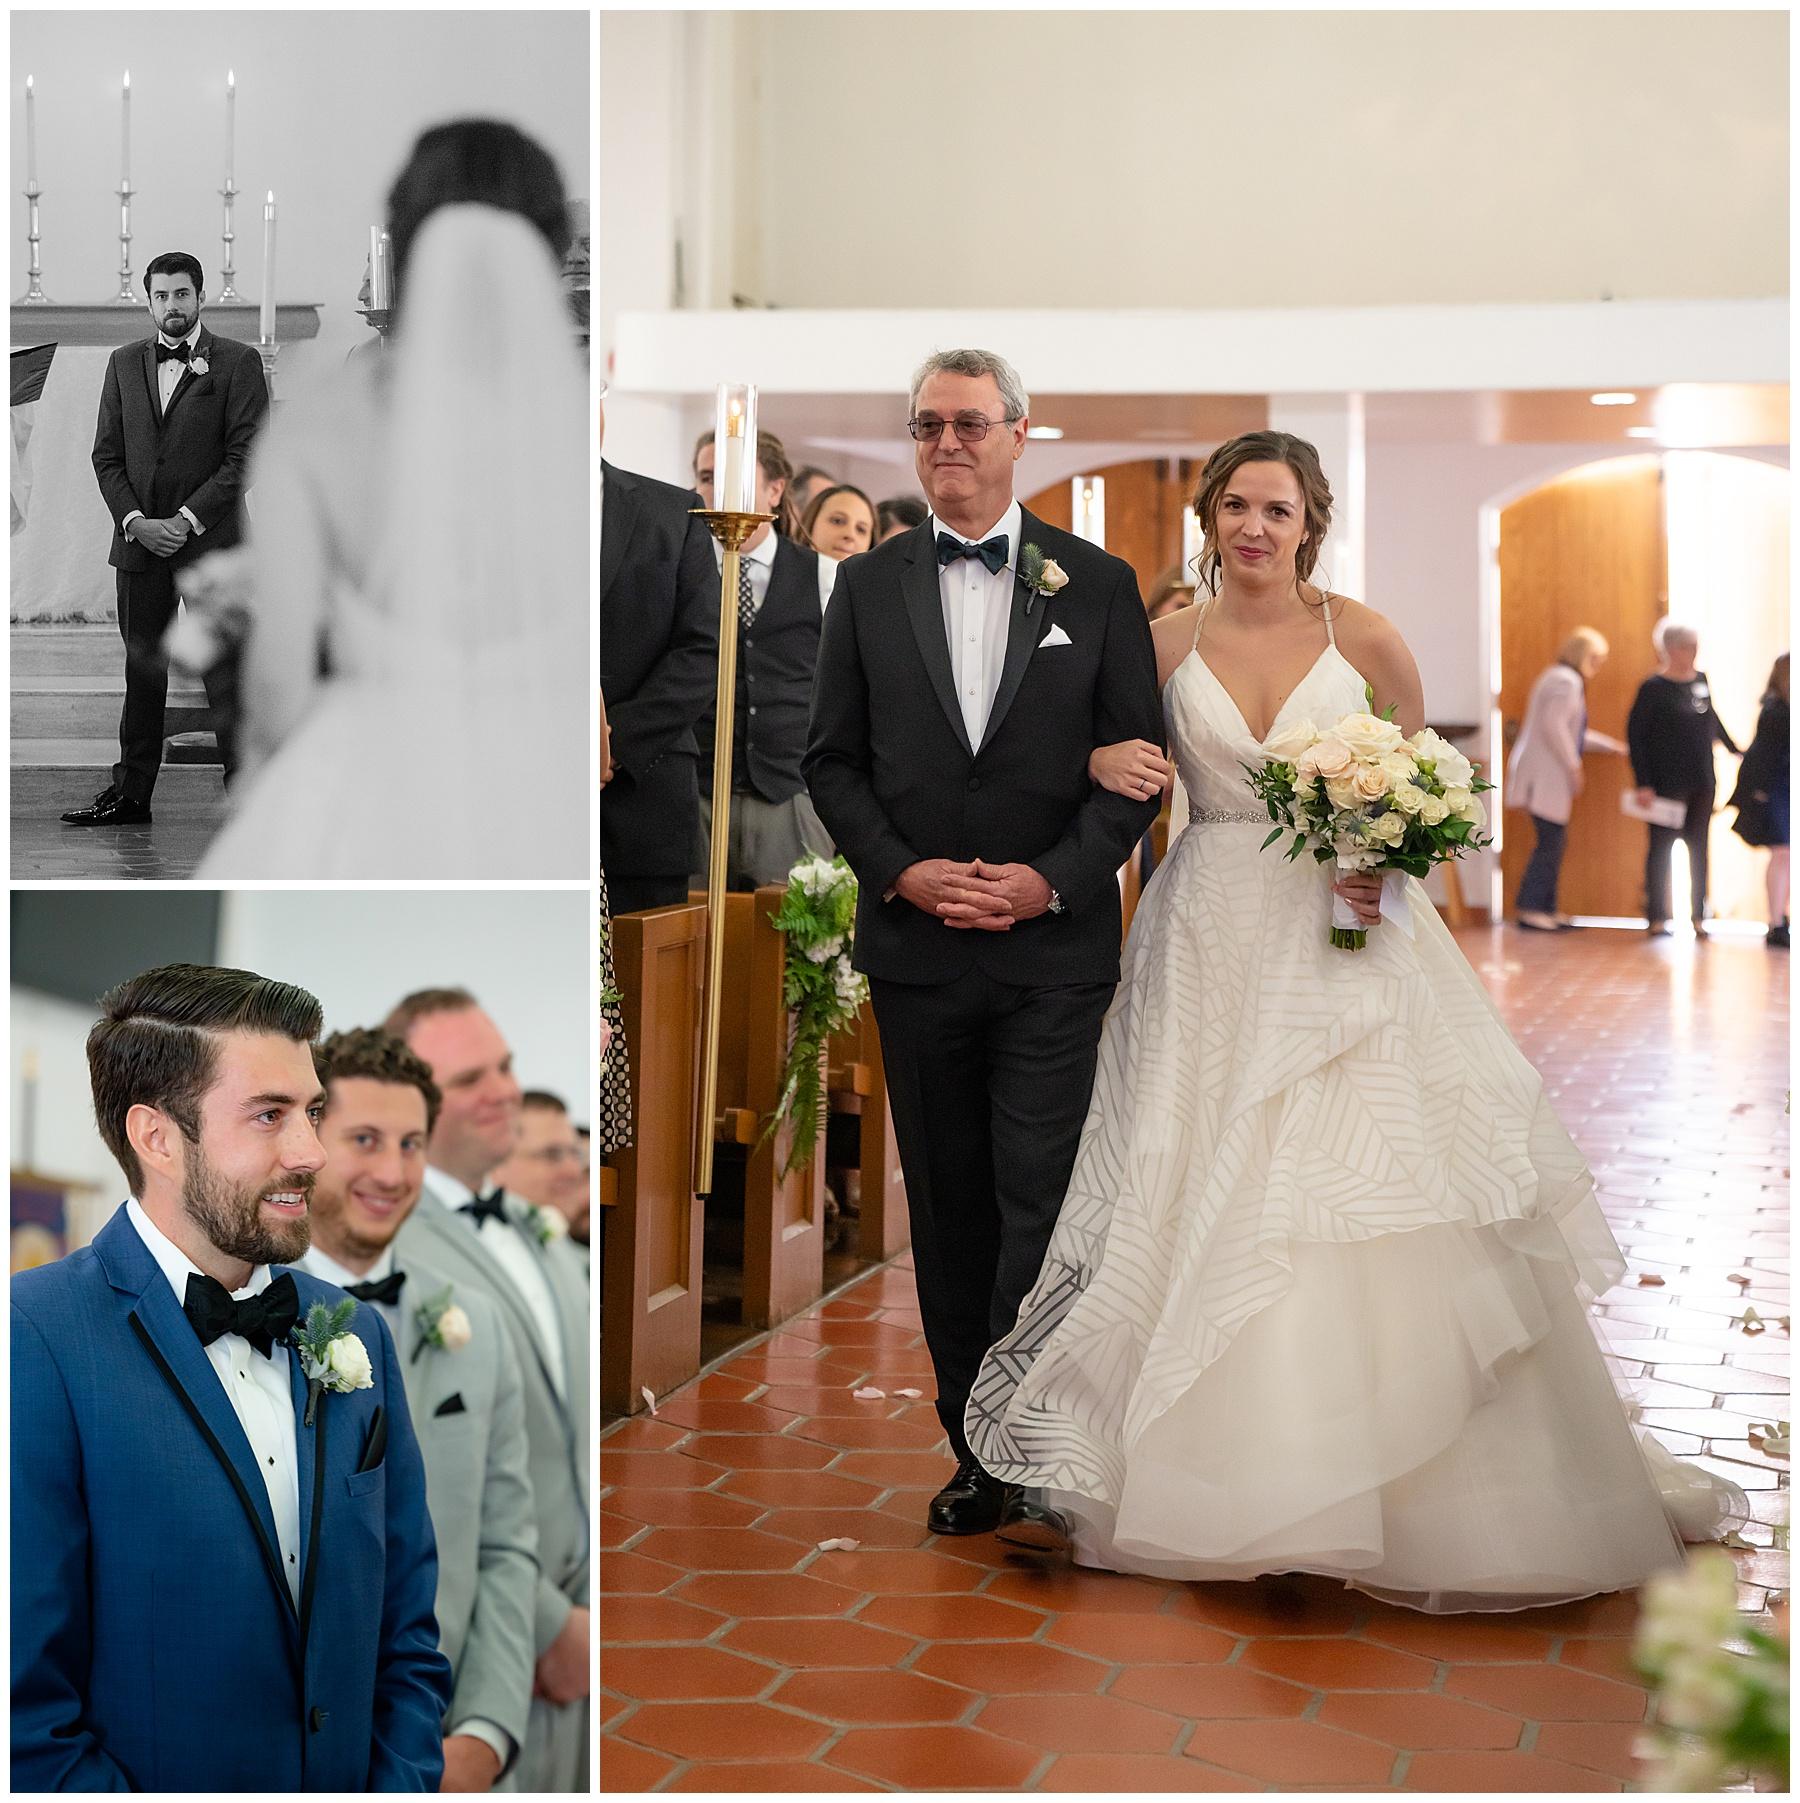 bride walking down the aisle st margaret's episcopal church san juan capistrano ca